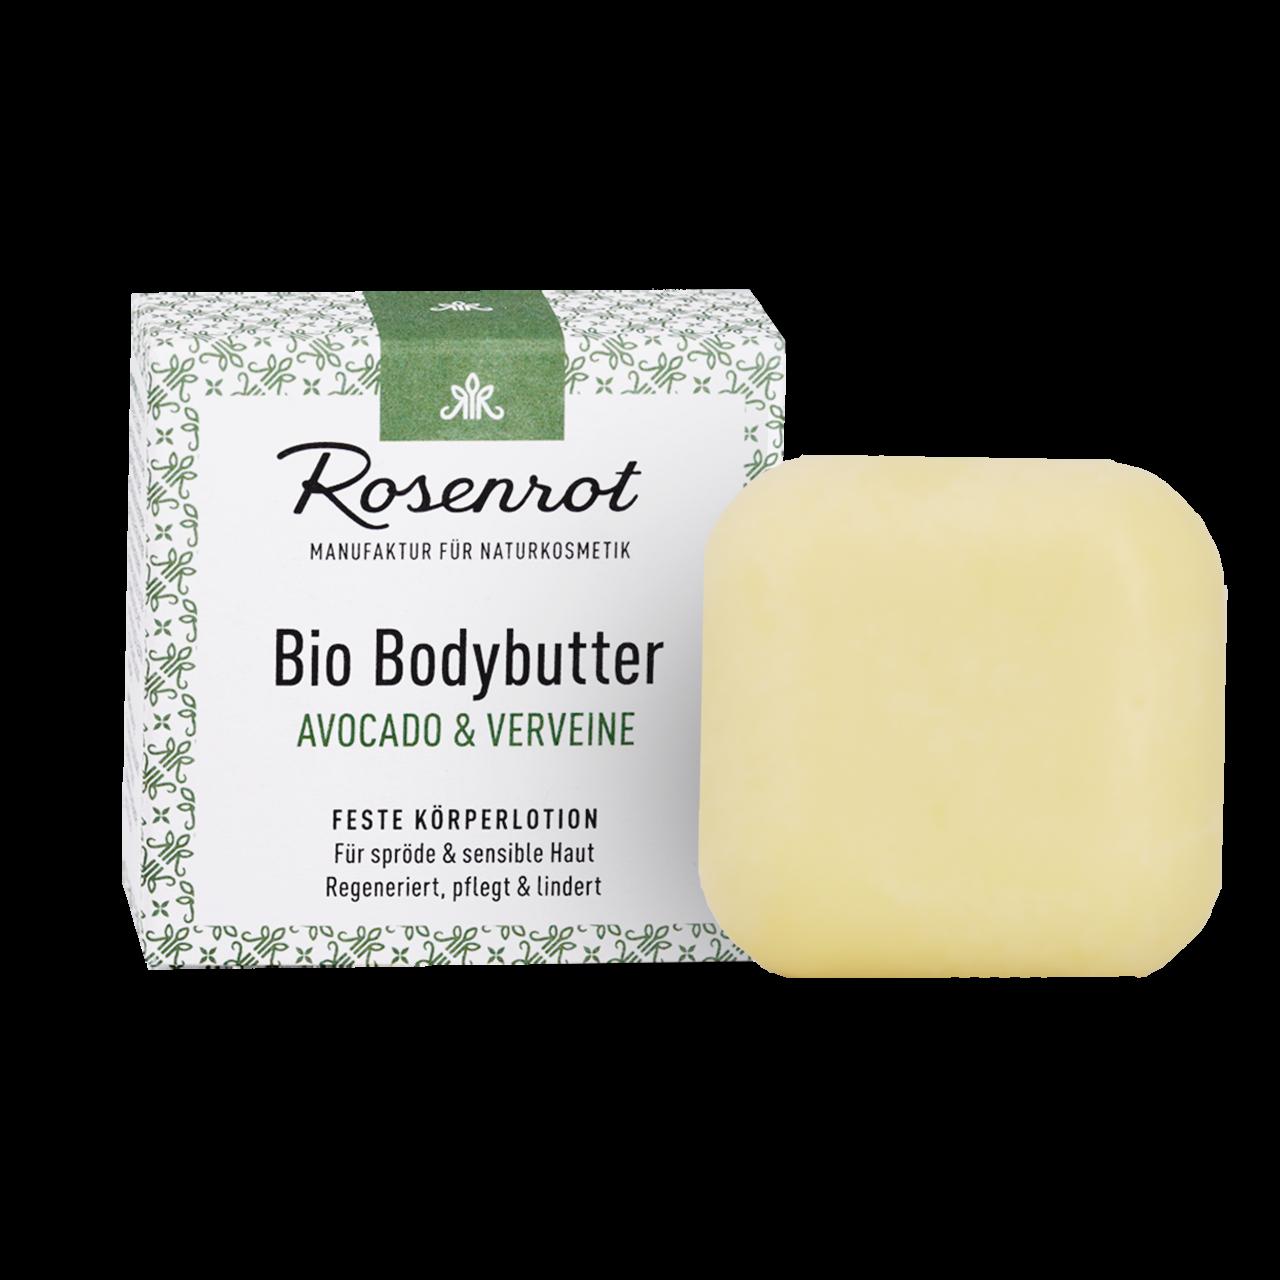 Organic Bodybutter Avocado & Verveine